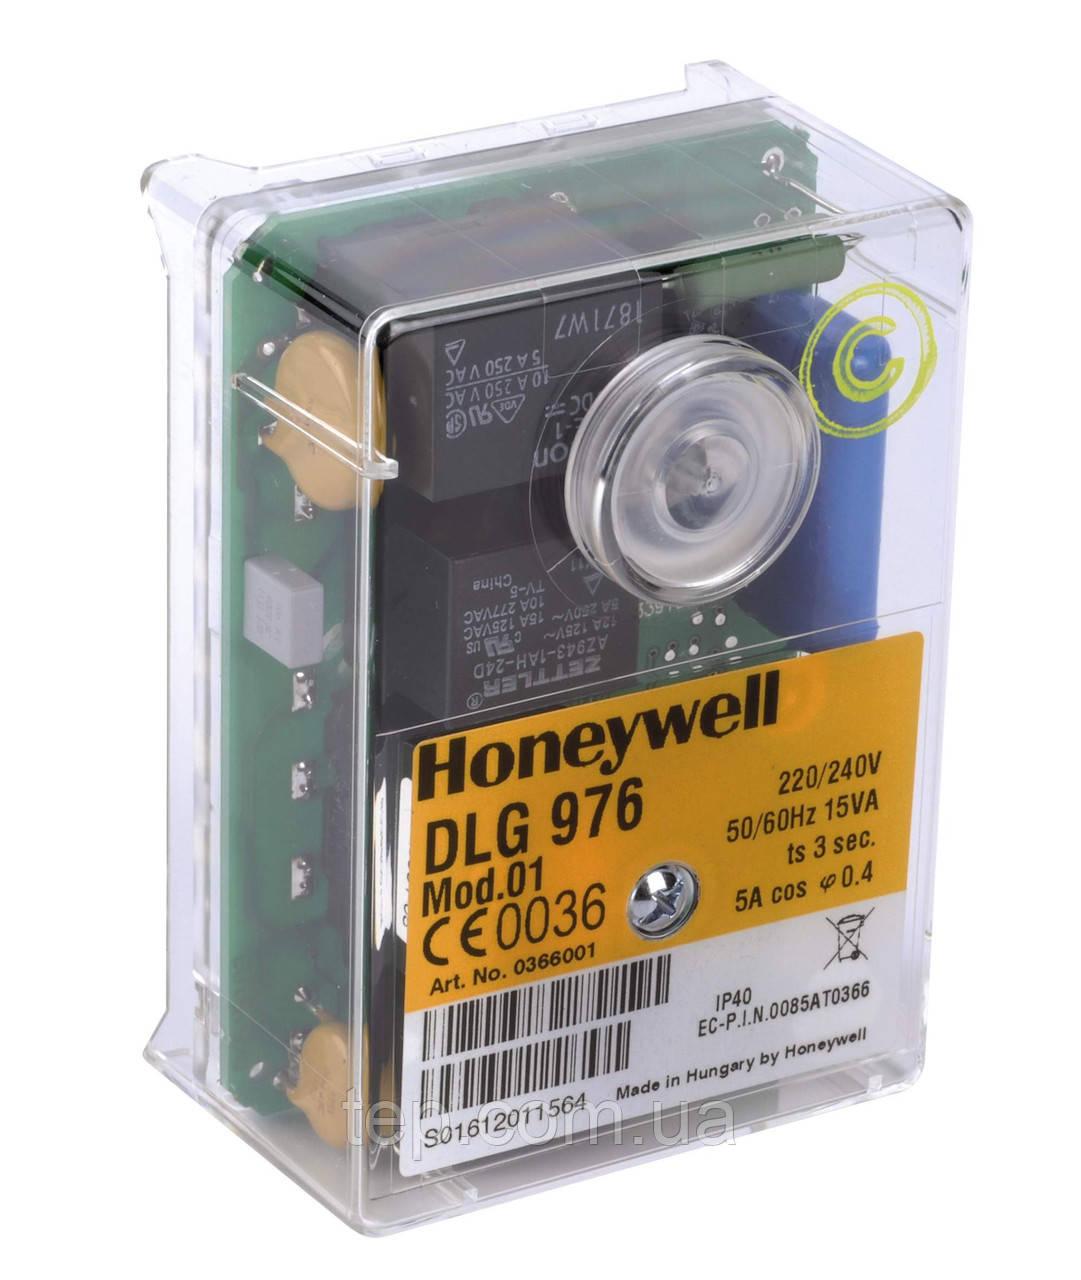 Honeywell DLG 976-N mod.01